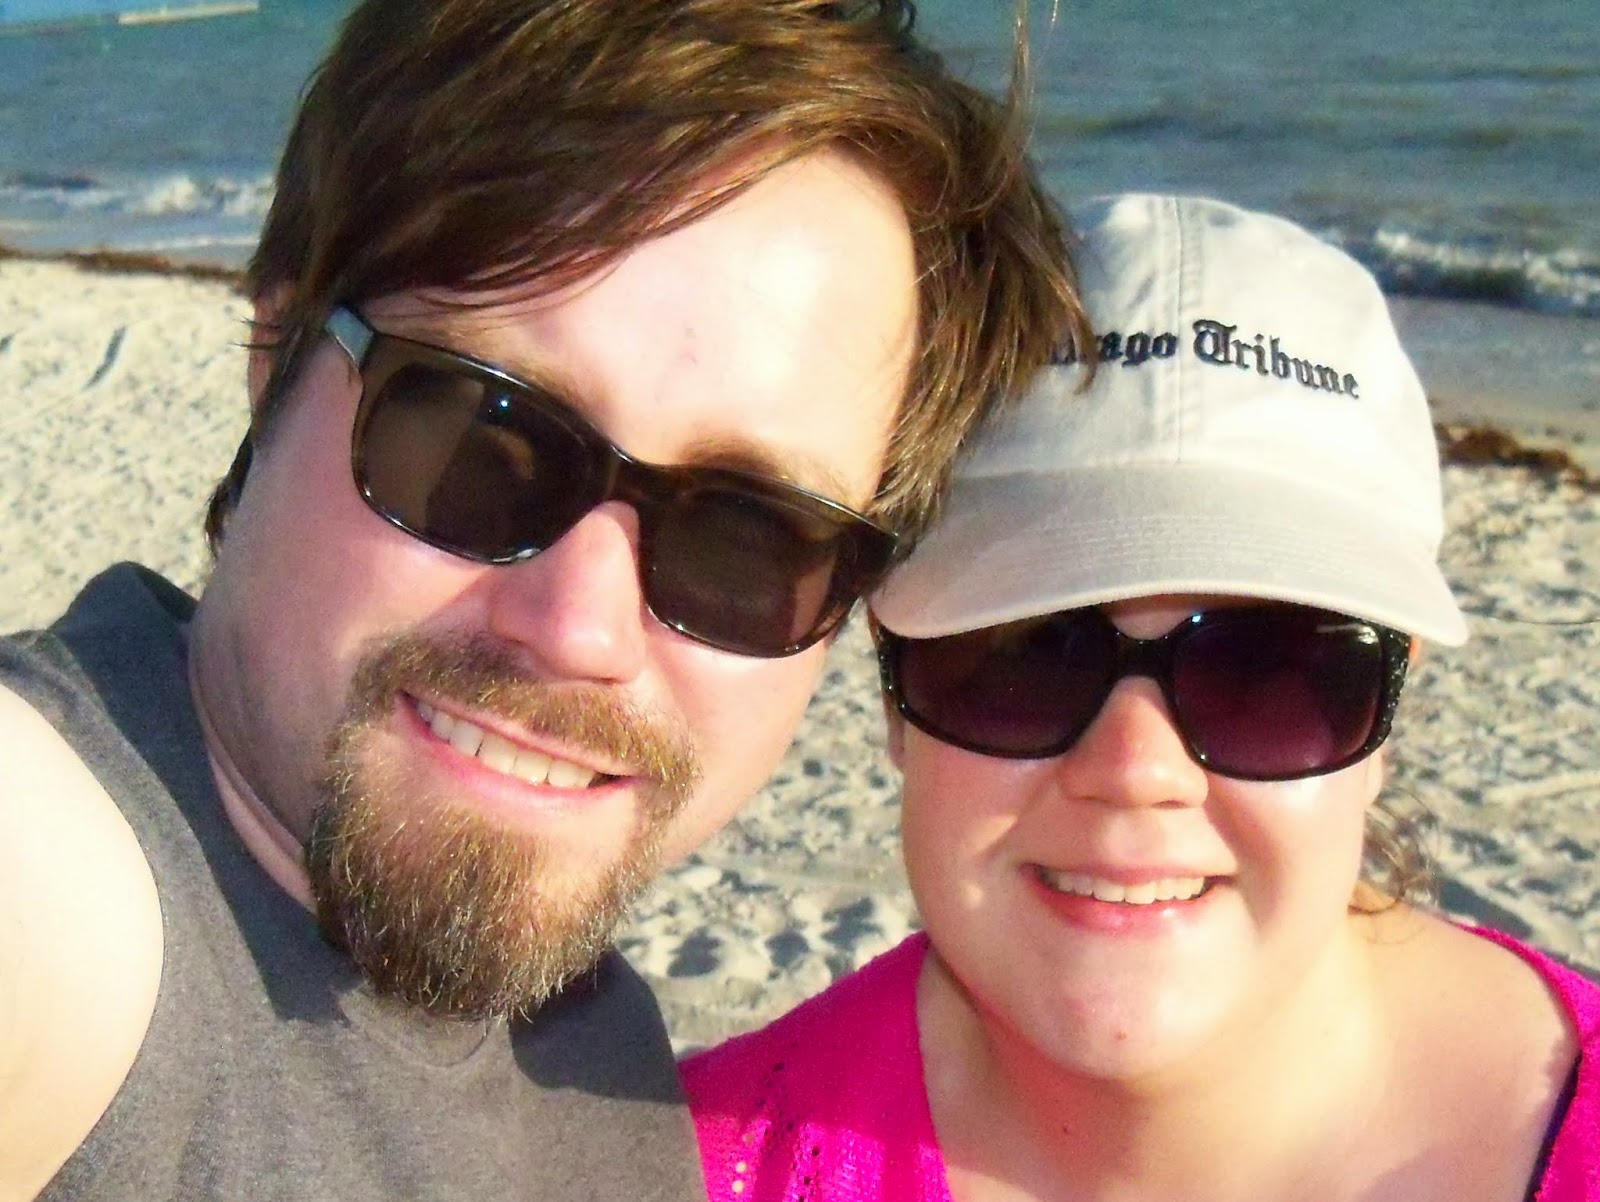 Key West Vacation - 116_5527.JPG